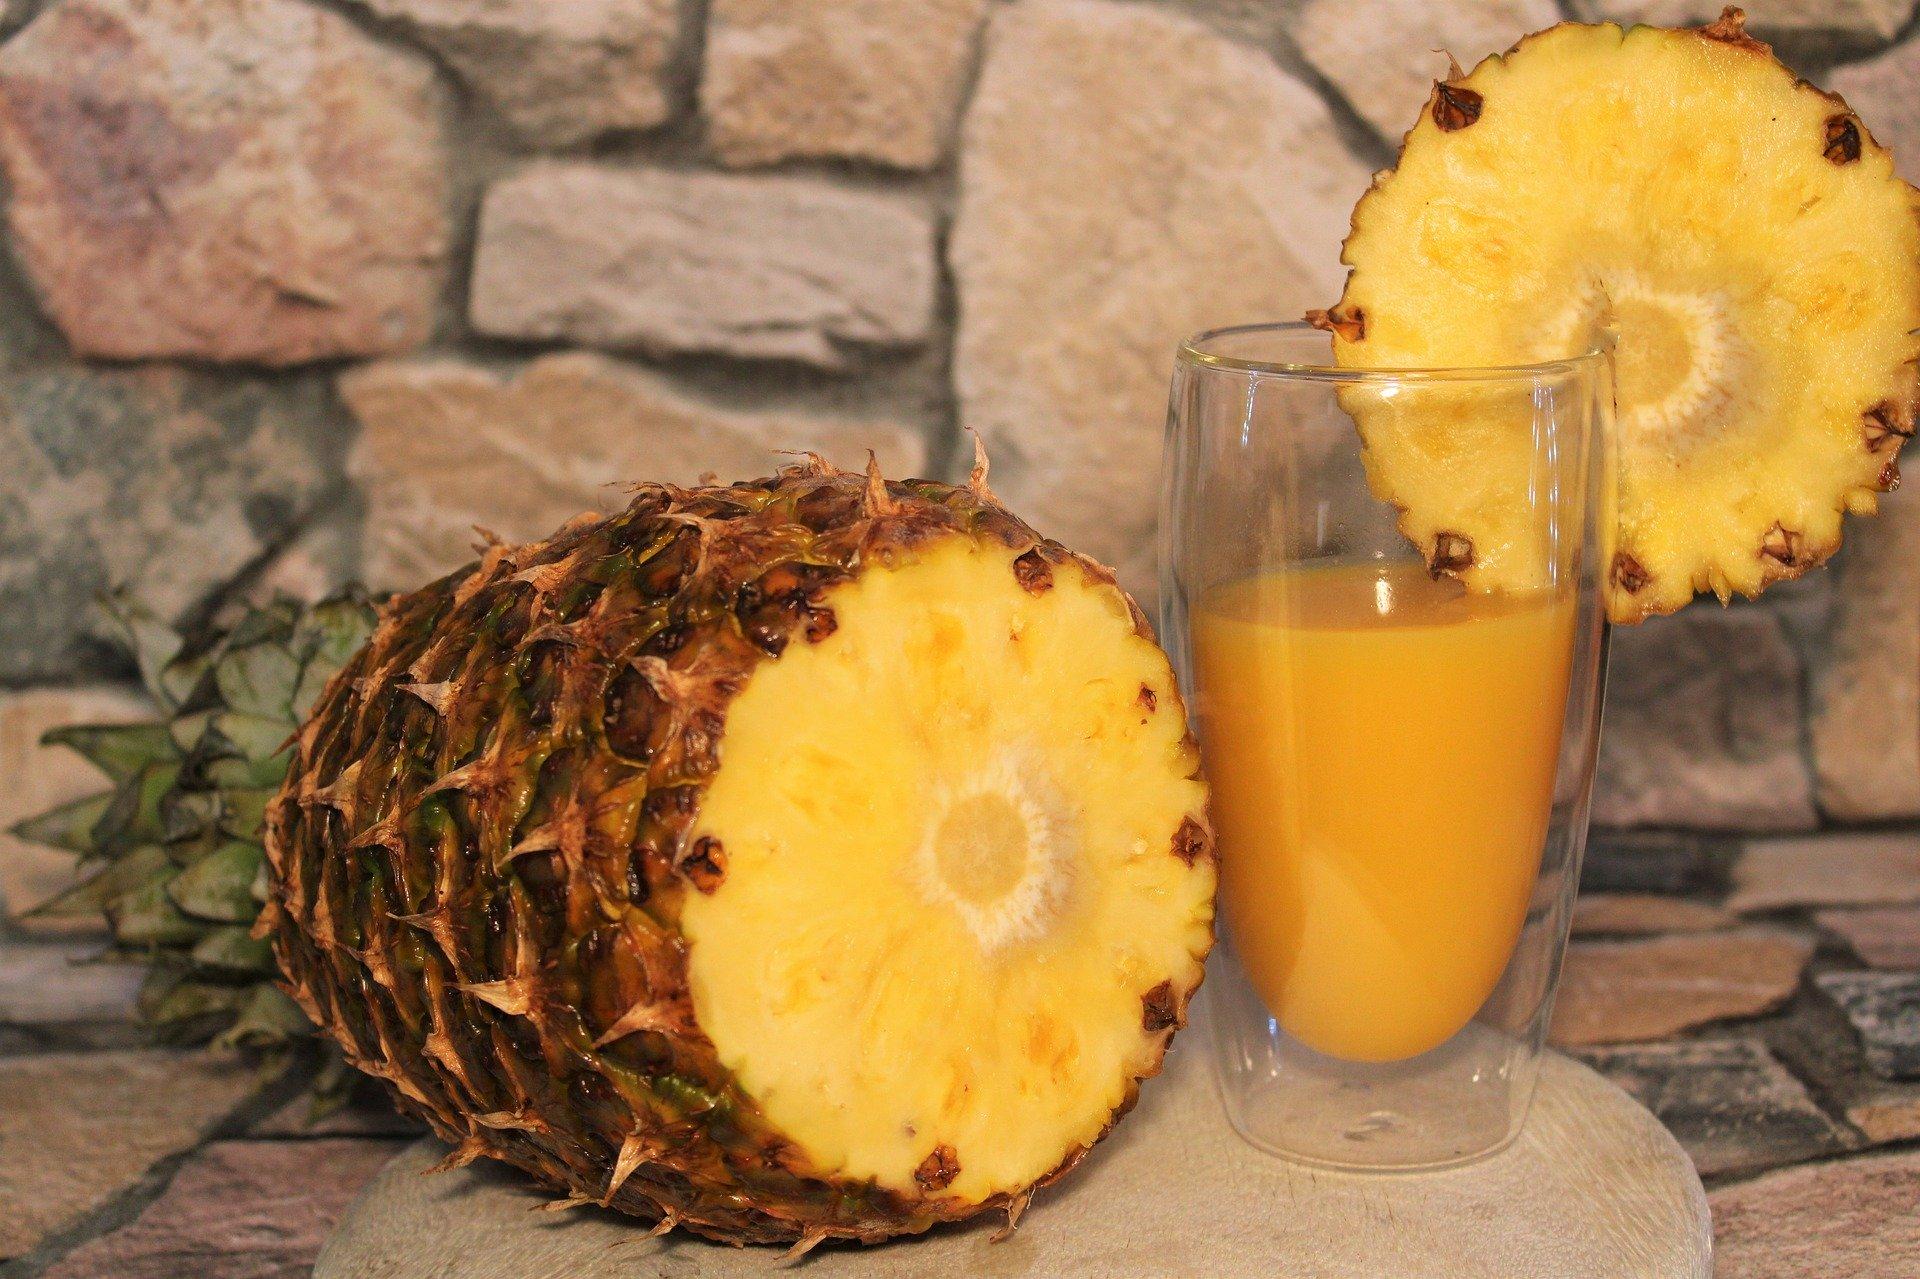 pineapple-4834341-1920-1